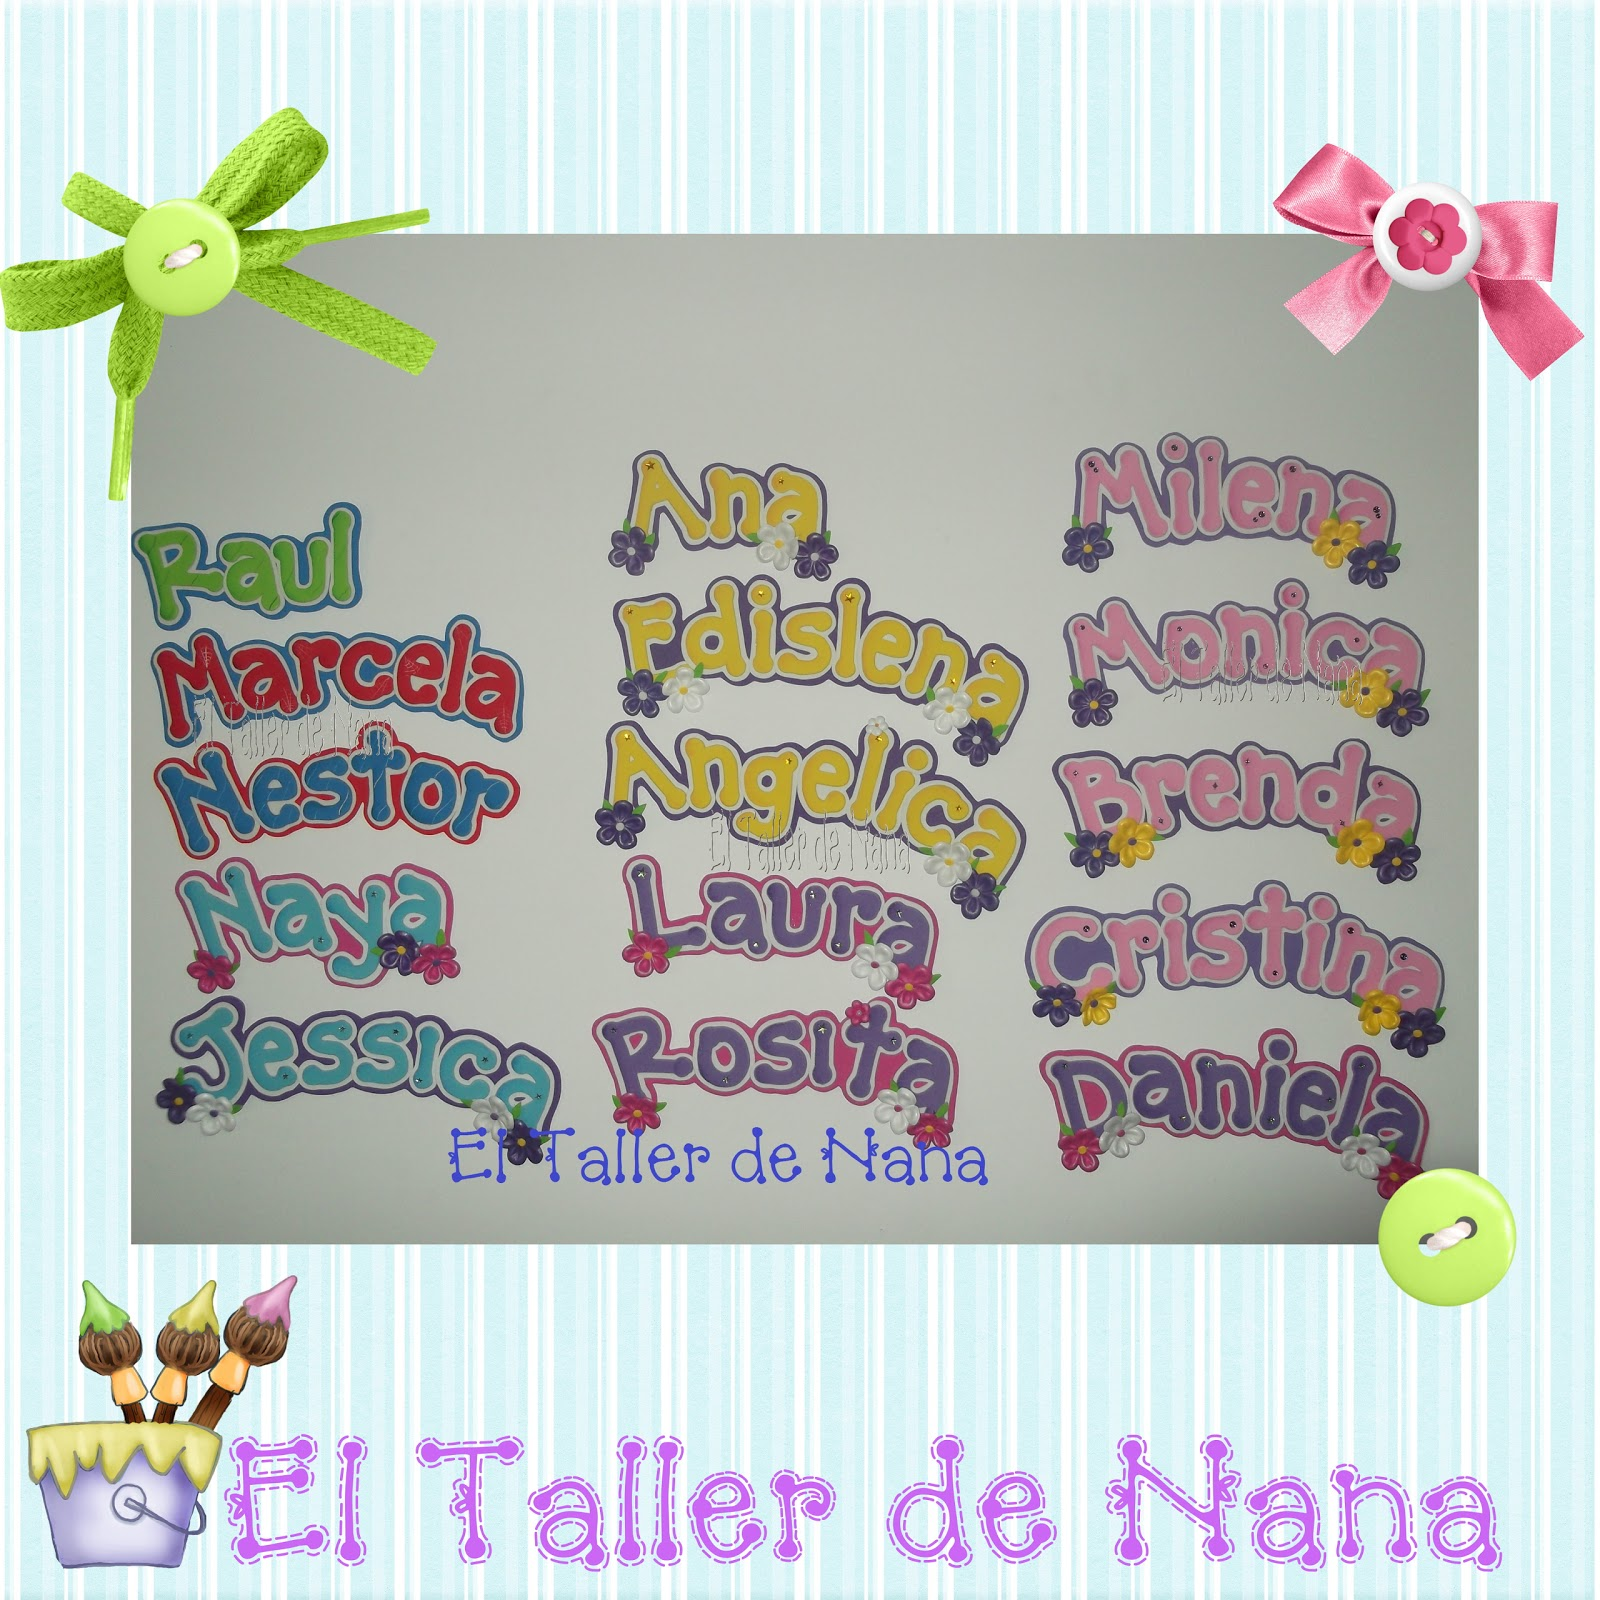 El Taller de Nana: Varios Nombres en Foami